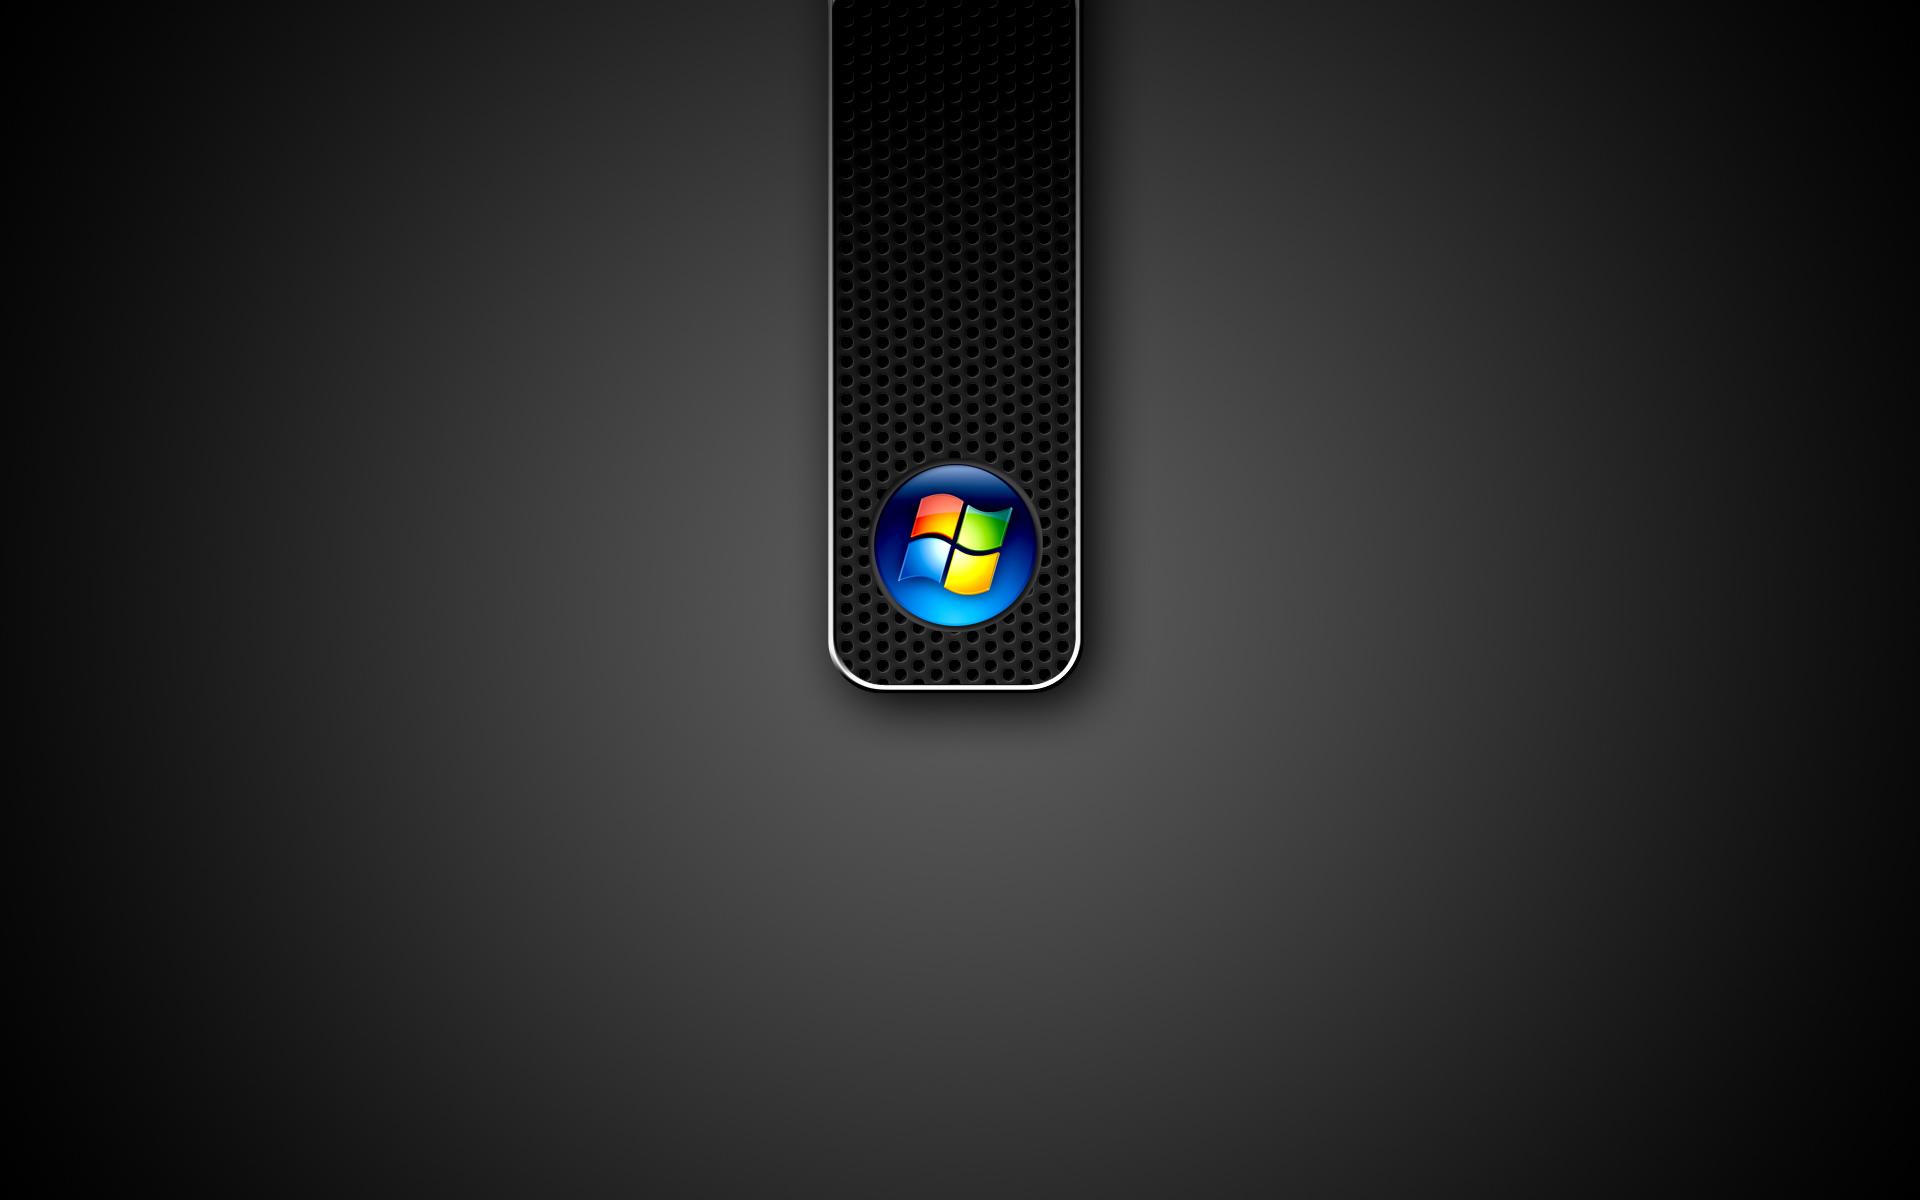 Windows 10 Hd Widescreen Wallpapers Wallpapersafari